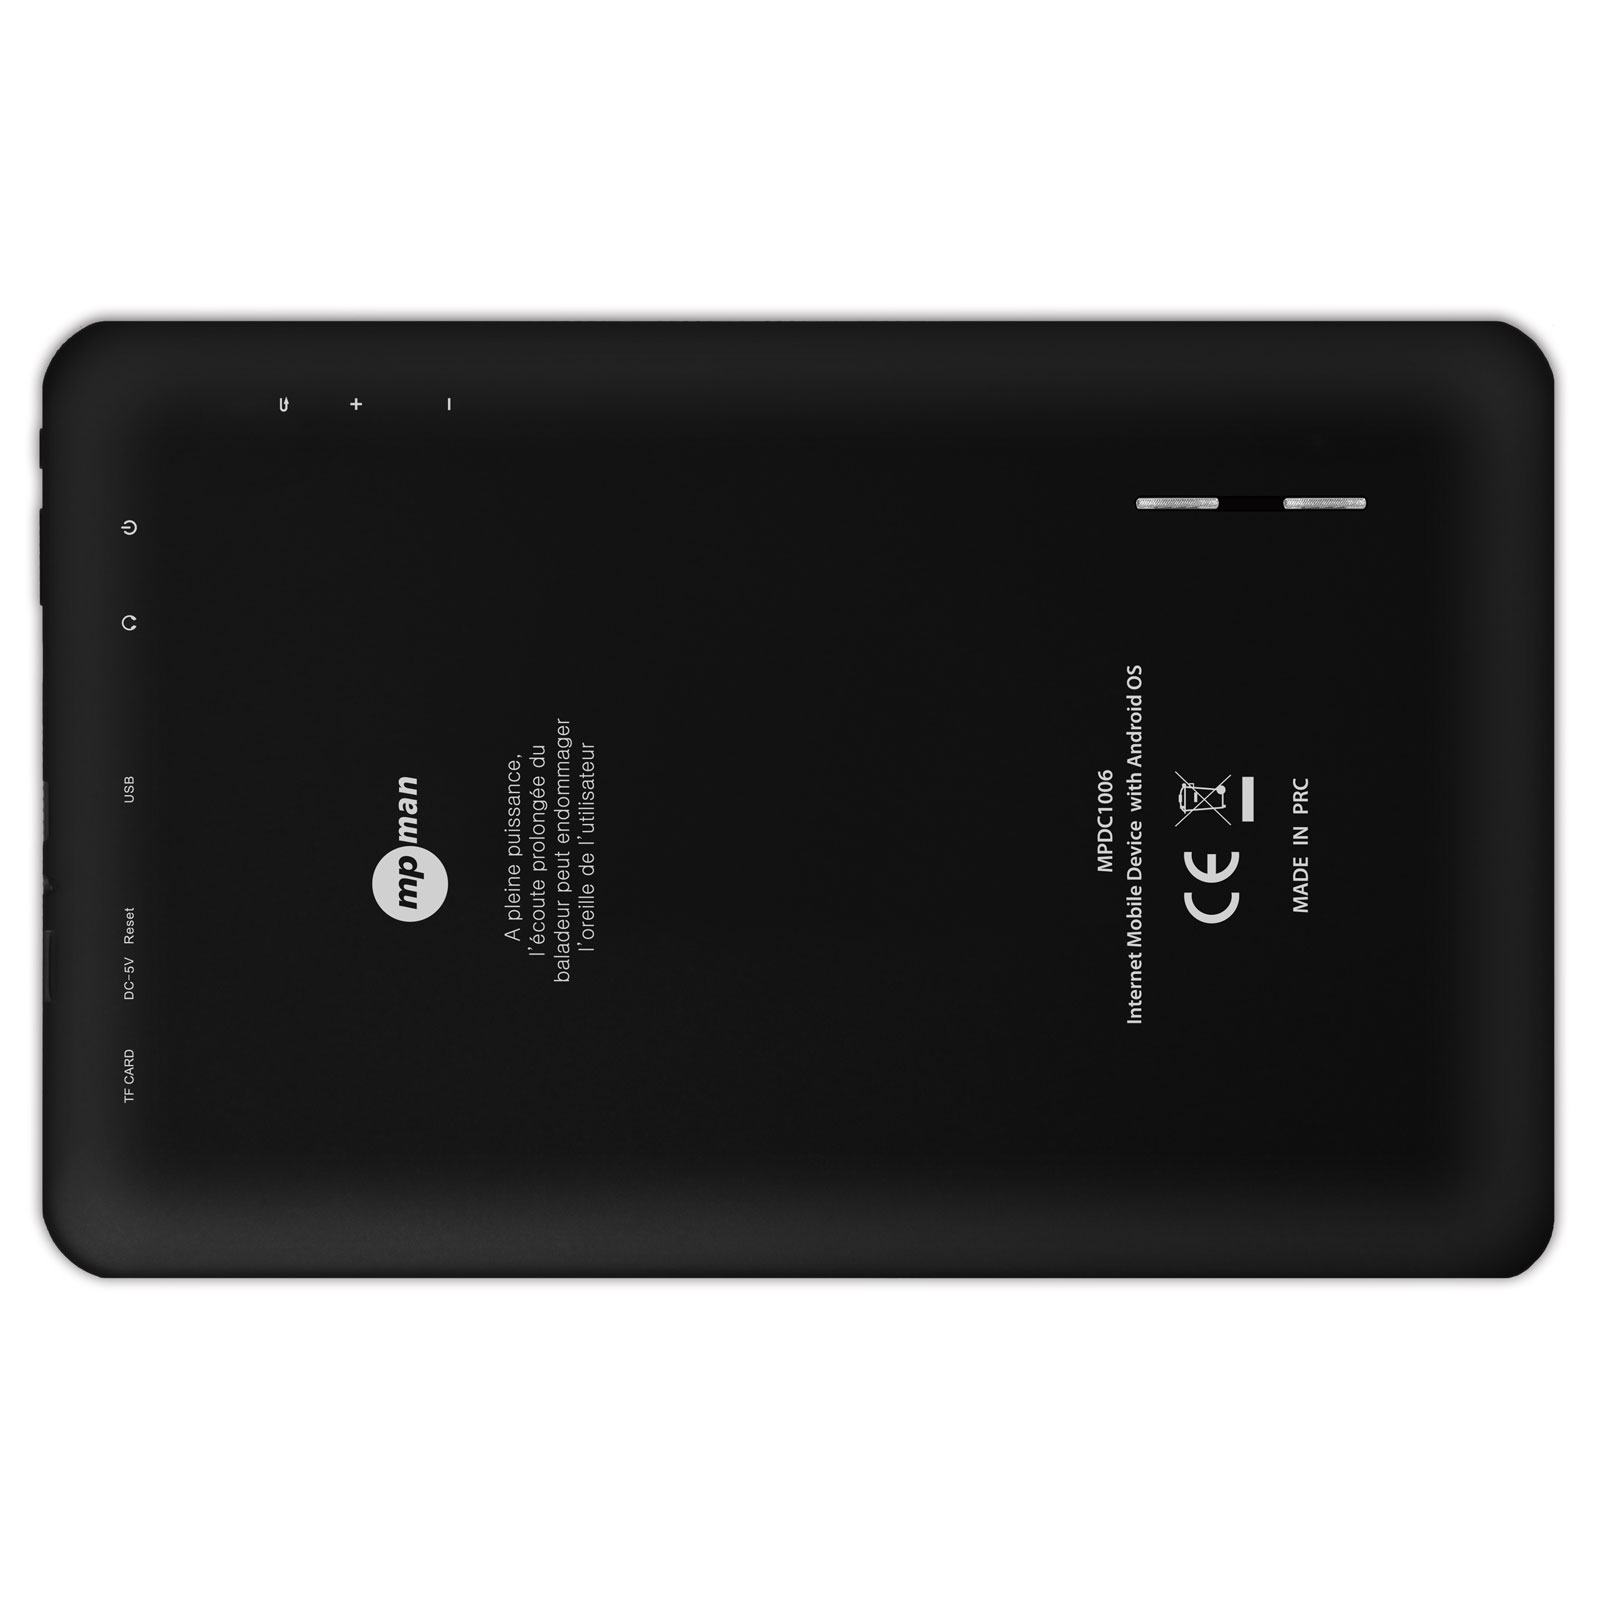 mpman mpqc1006 16 go tablette tactile mp man sur. Black Bedroom Furniture Sets. Home Design Ideas